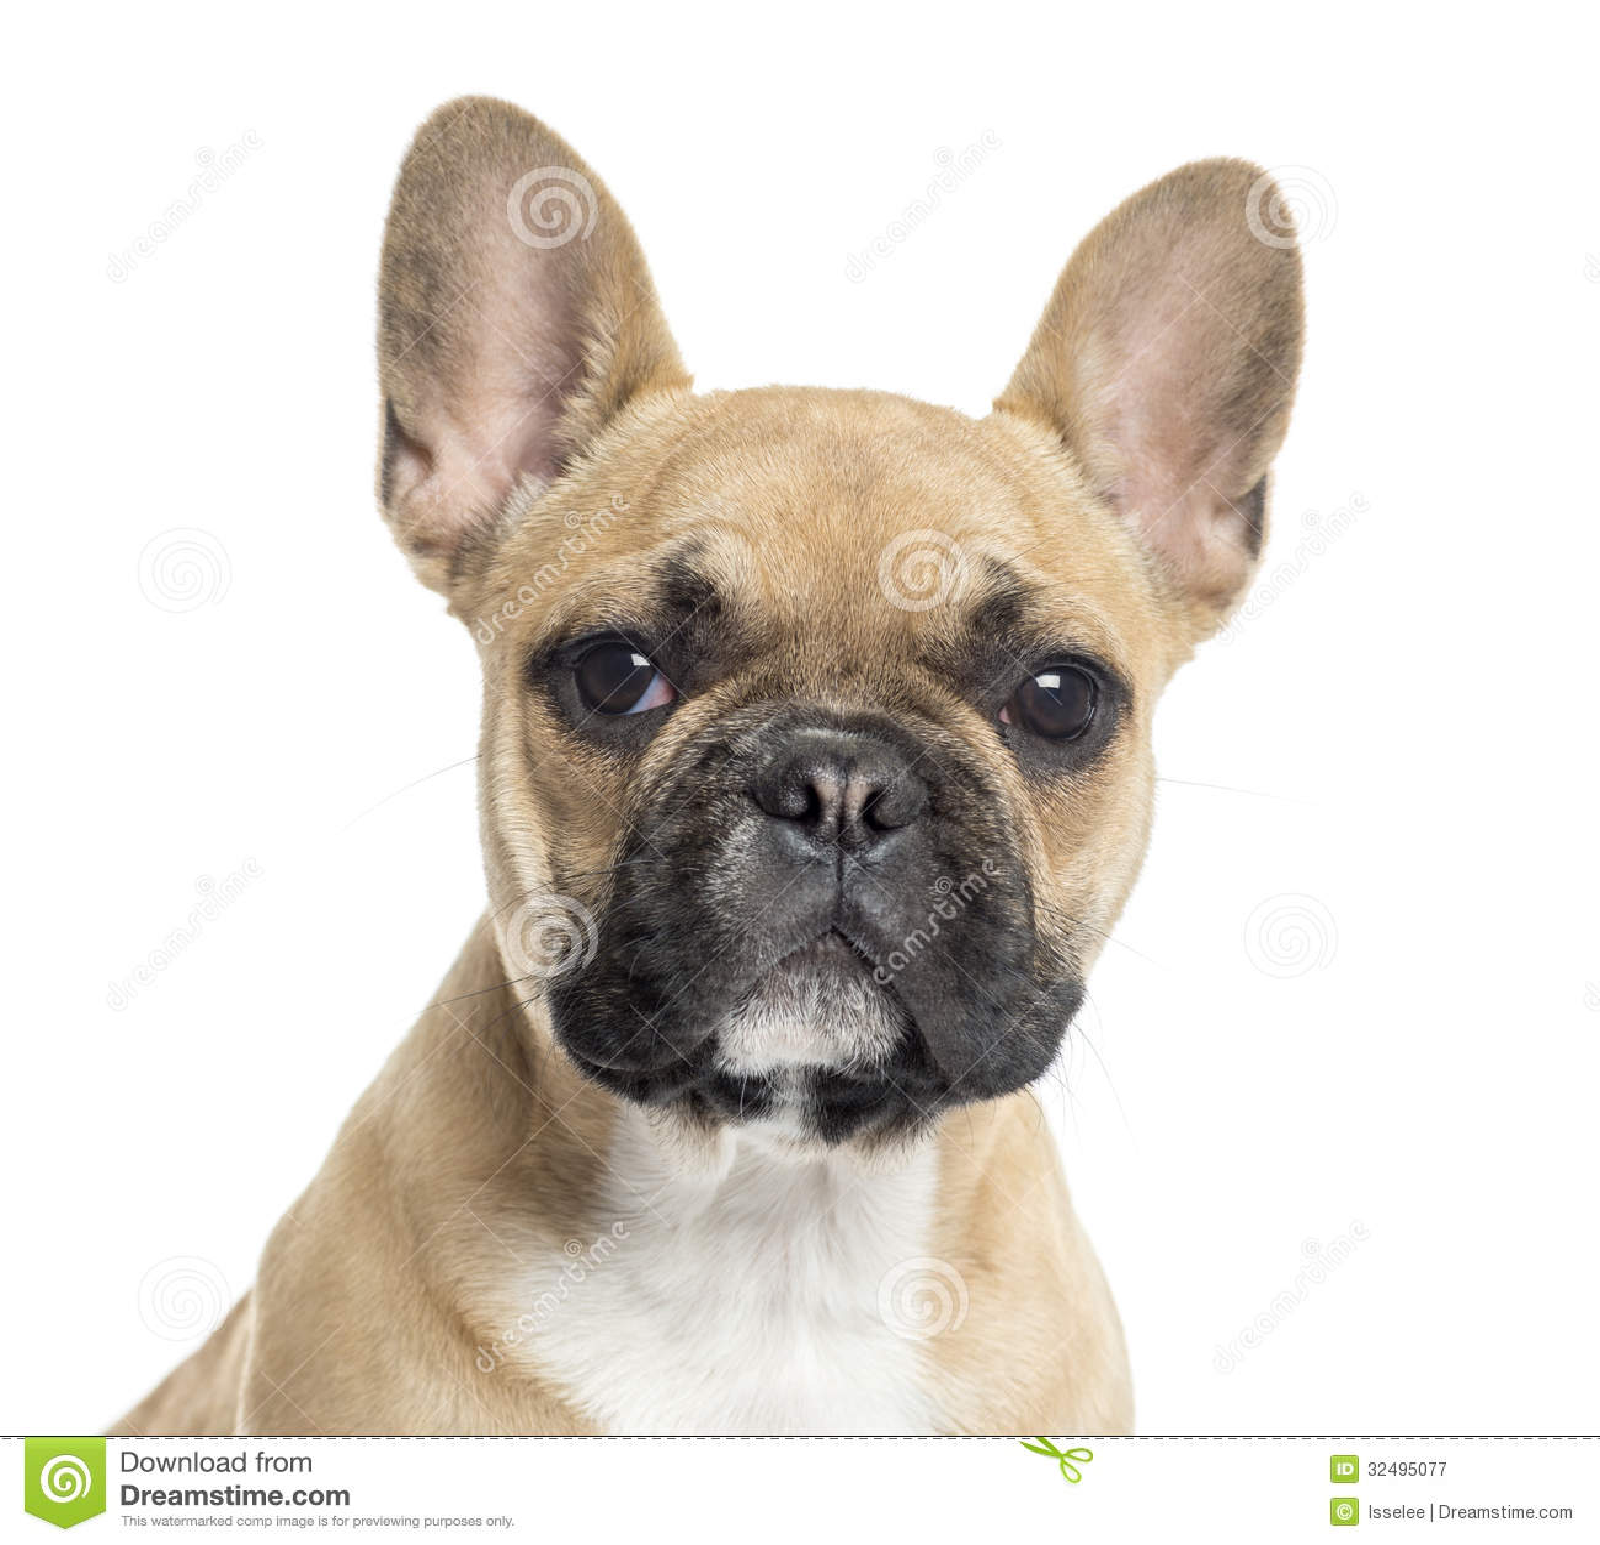 Close up of a French Bulldog puppy looking at the camera